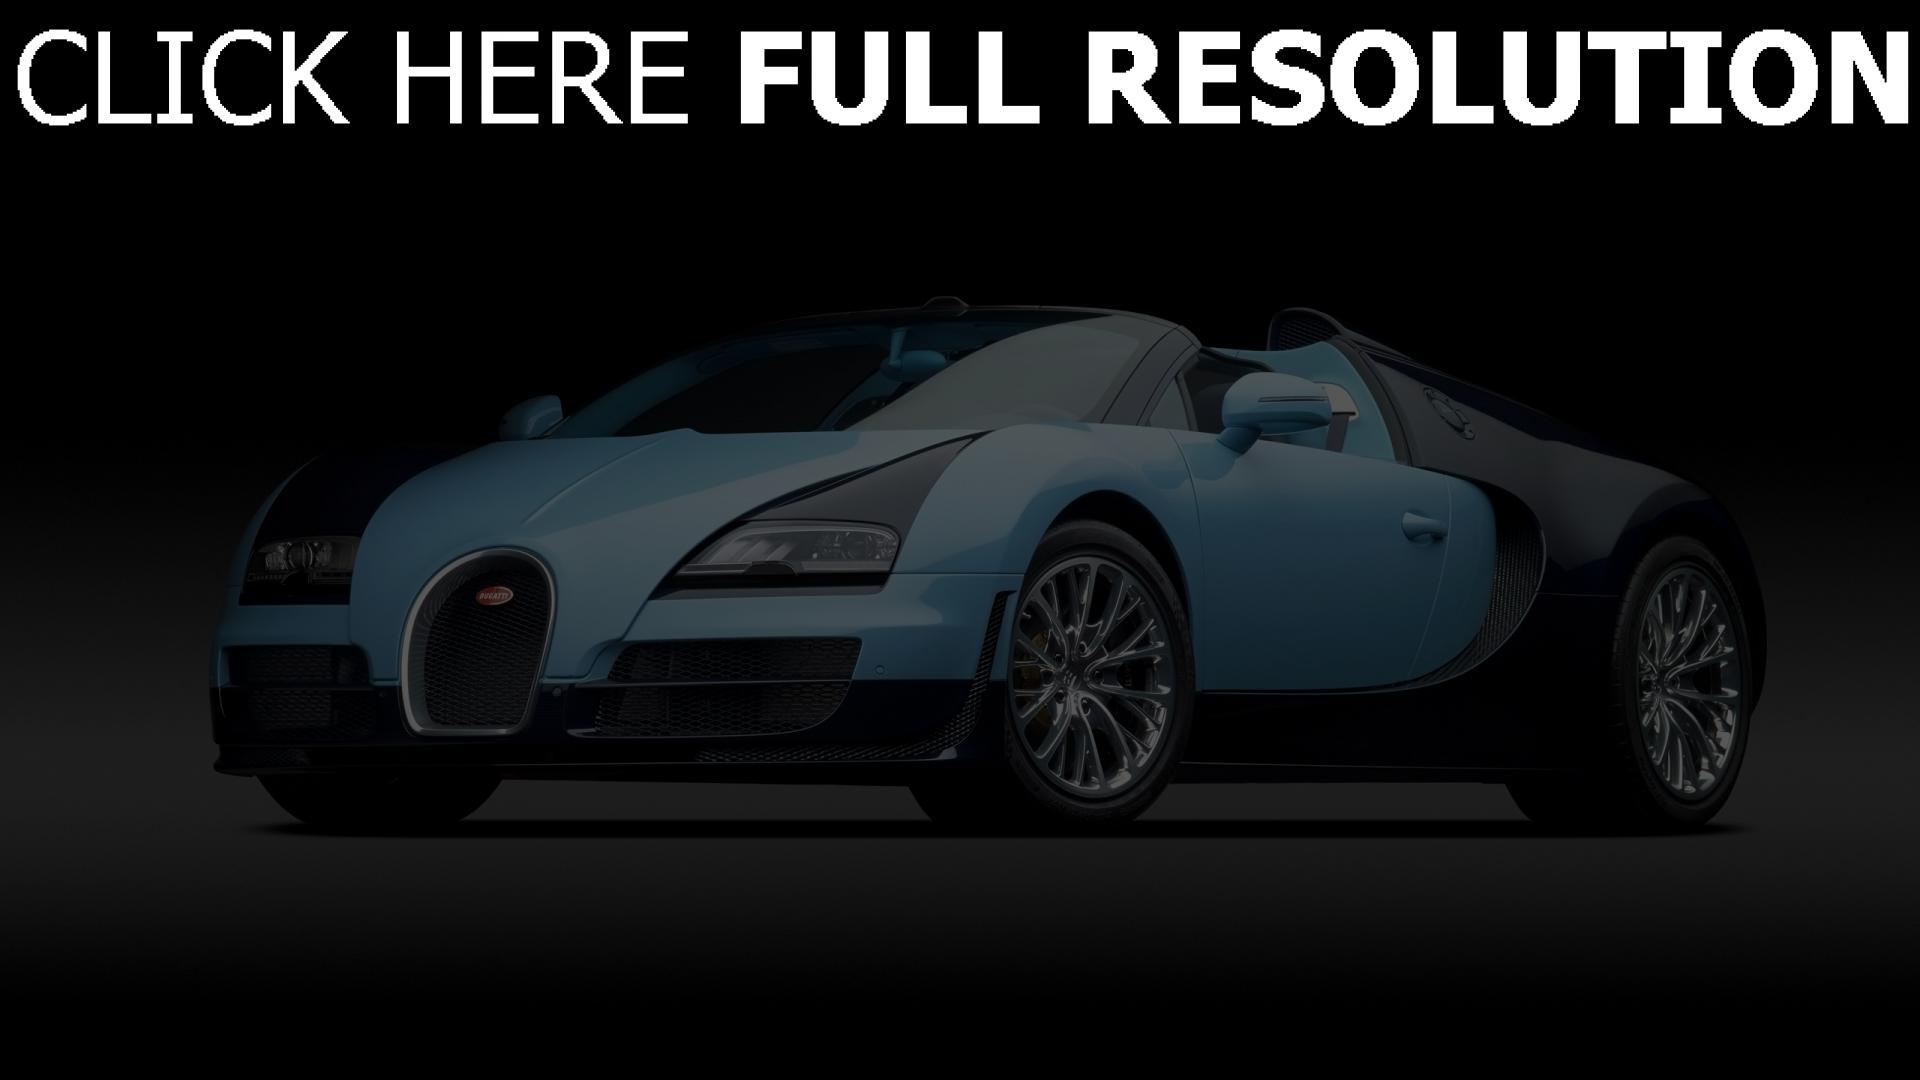 vitesse-bugatti-veyron-sport-jean-pierre-veyron-car-bugatti-wimille-grand-veyron Astounding Bugatti Veyron Grand Sport Vitesse Geschwindigkeit Cars Trend